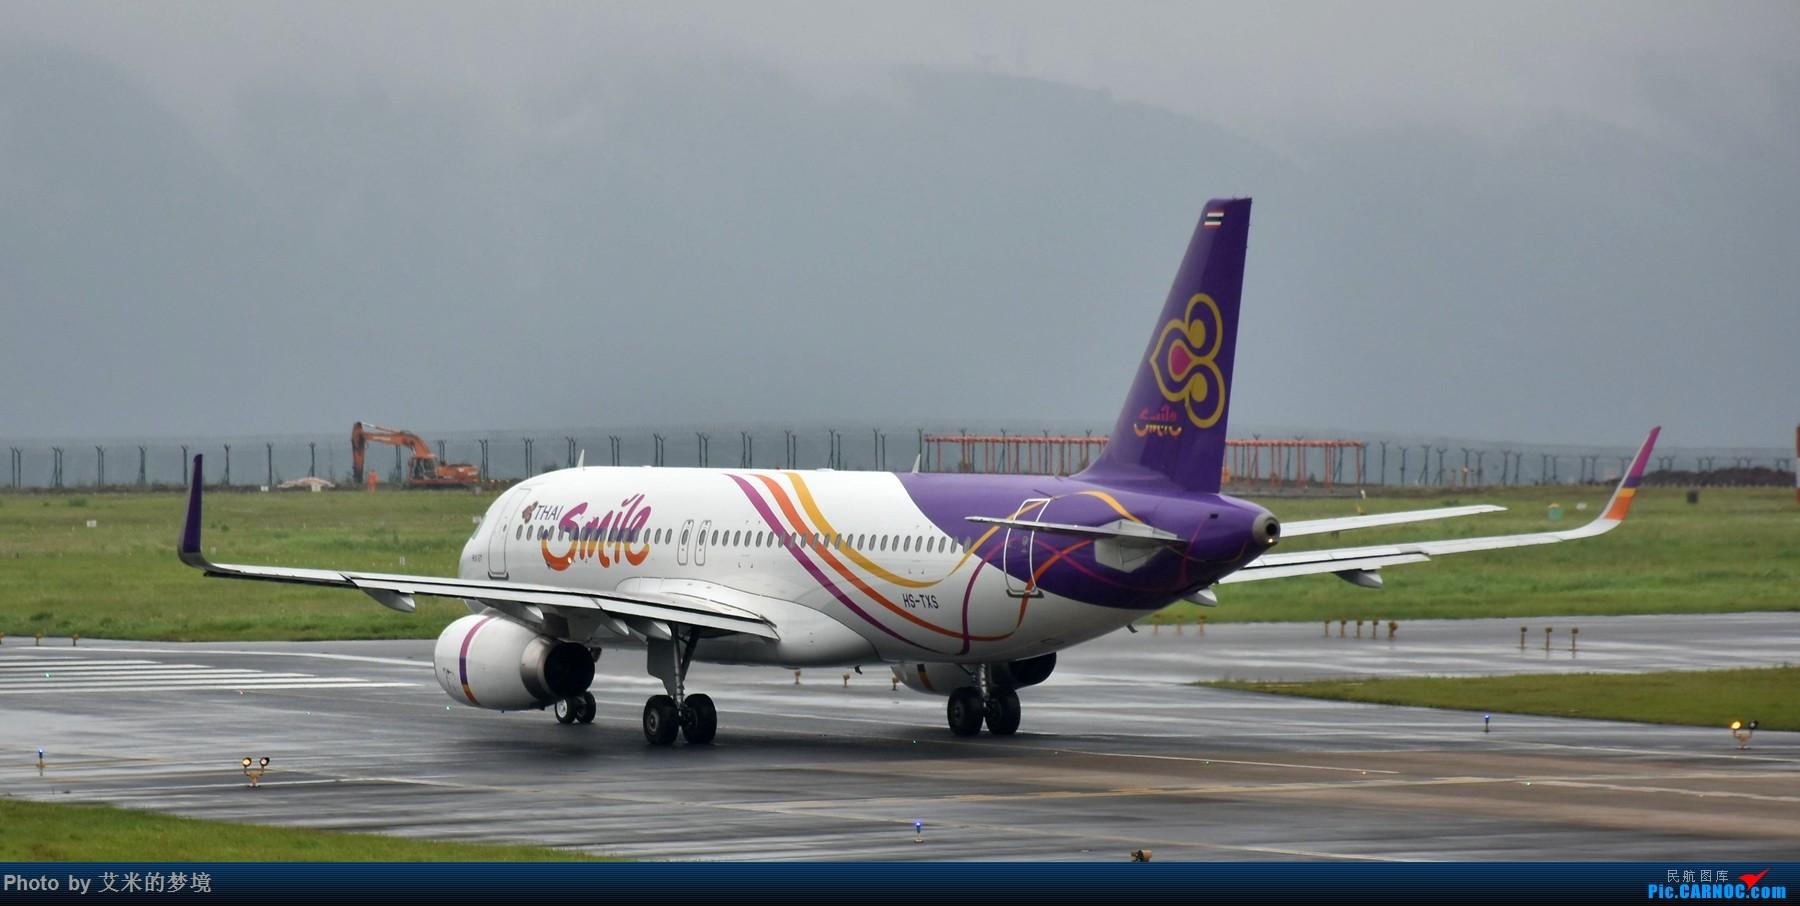 Re:[原创]【carnoc重庆飞友会】7.14雨中奔袭。。又被放鸽子的首航日 AIRBUS A320-200 HS-TXS 中国重庆江北国际机场